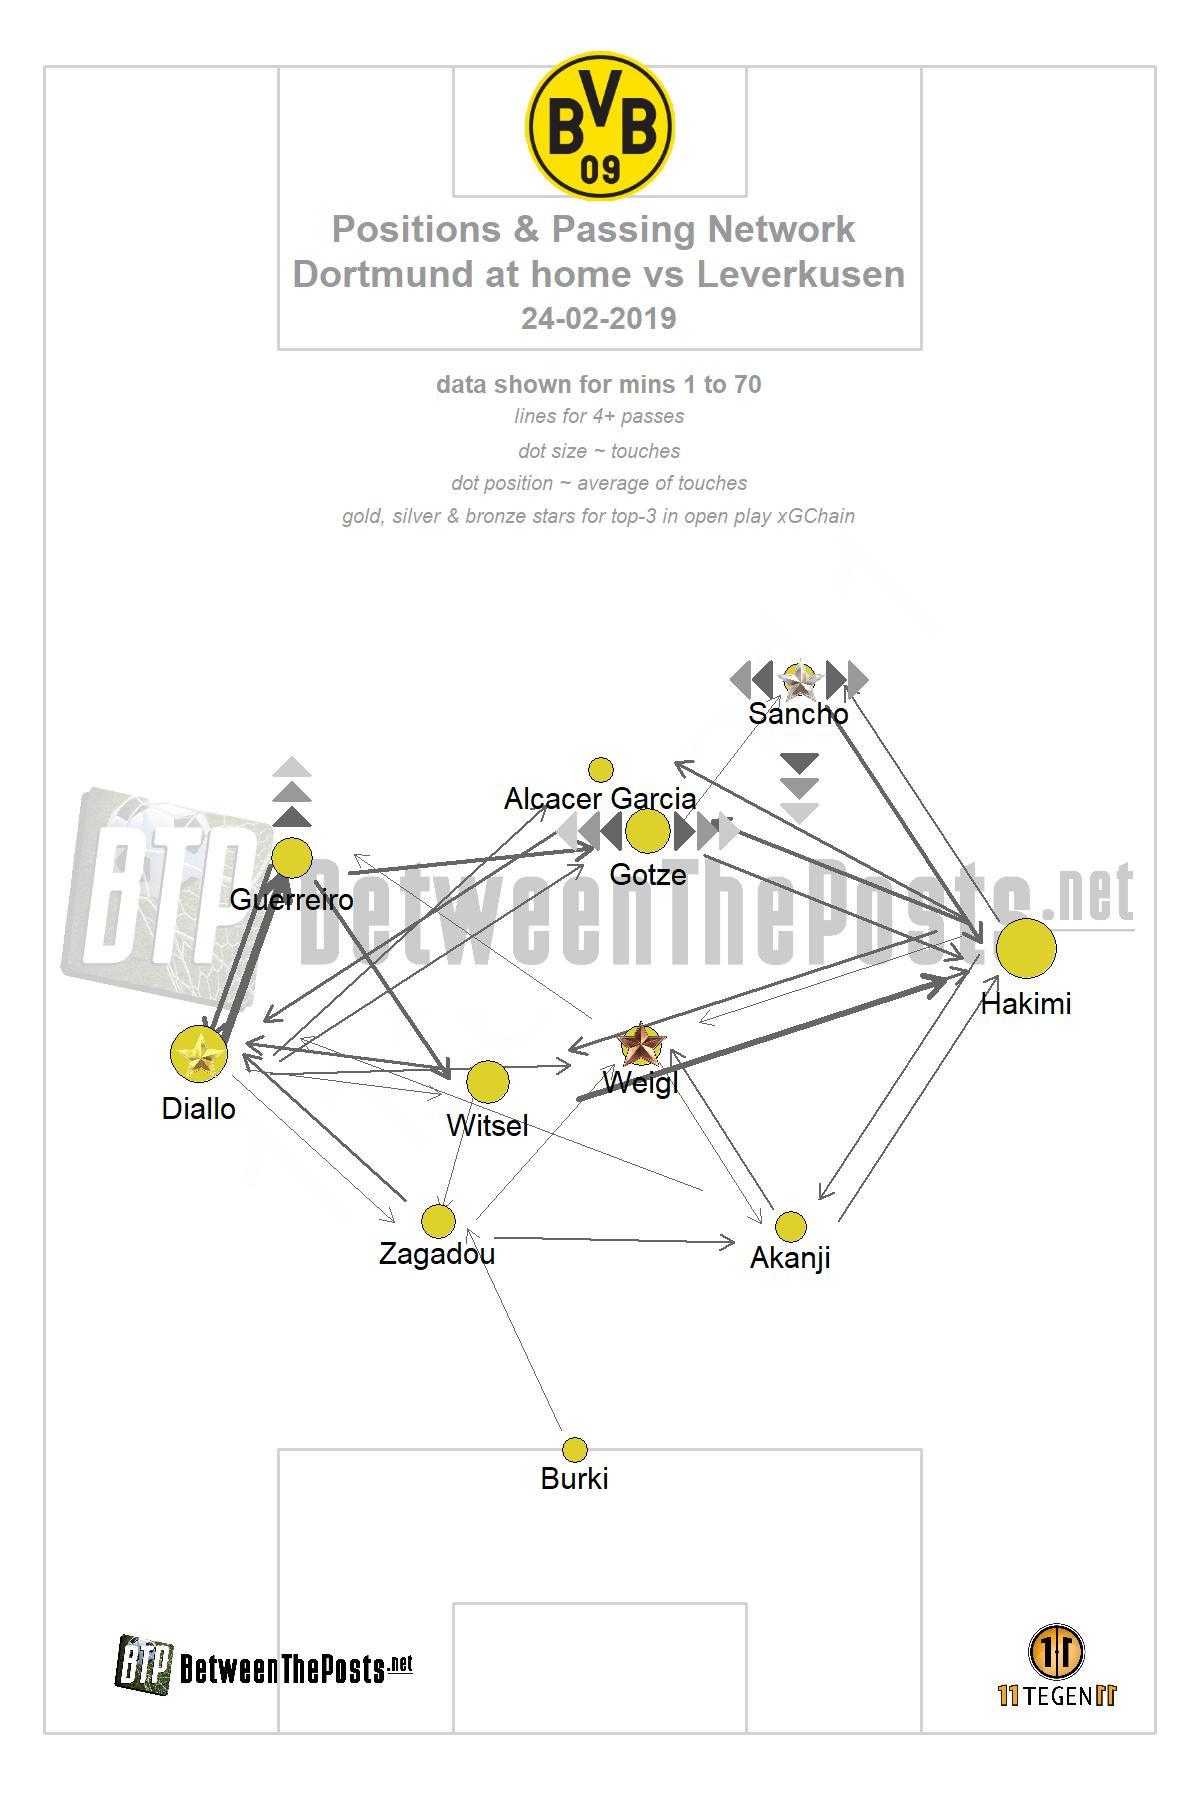 Passmap Borussia Dortmund - Bayer Leverkusen 3-2 Bundesliga